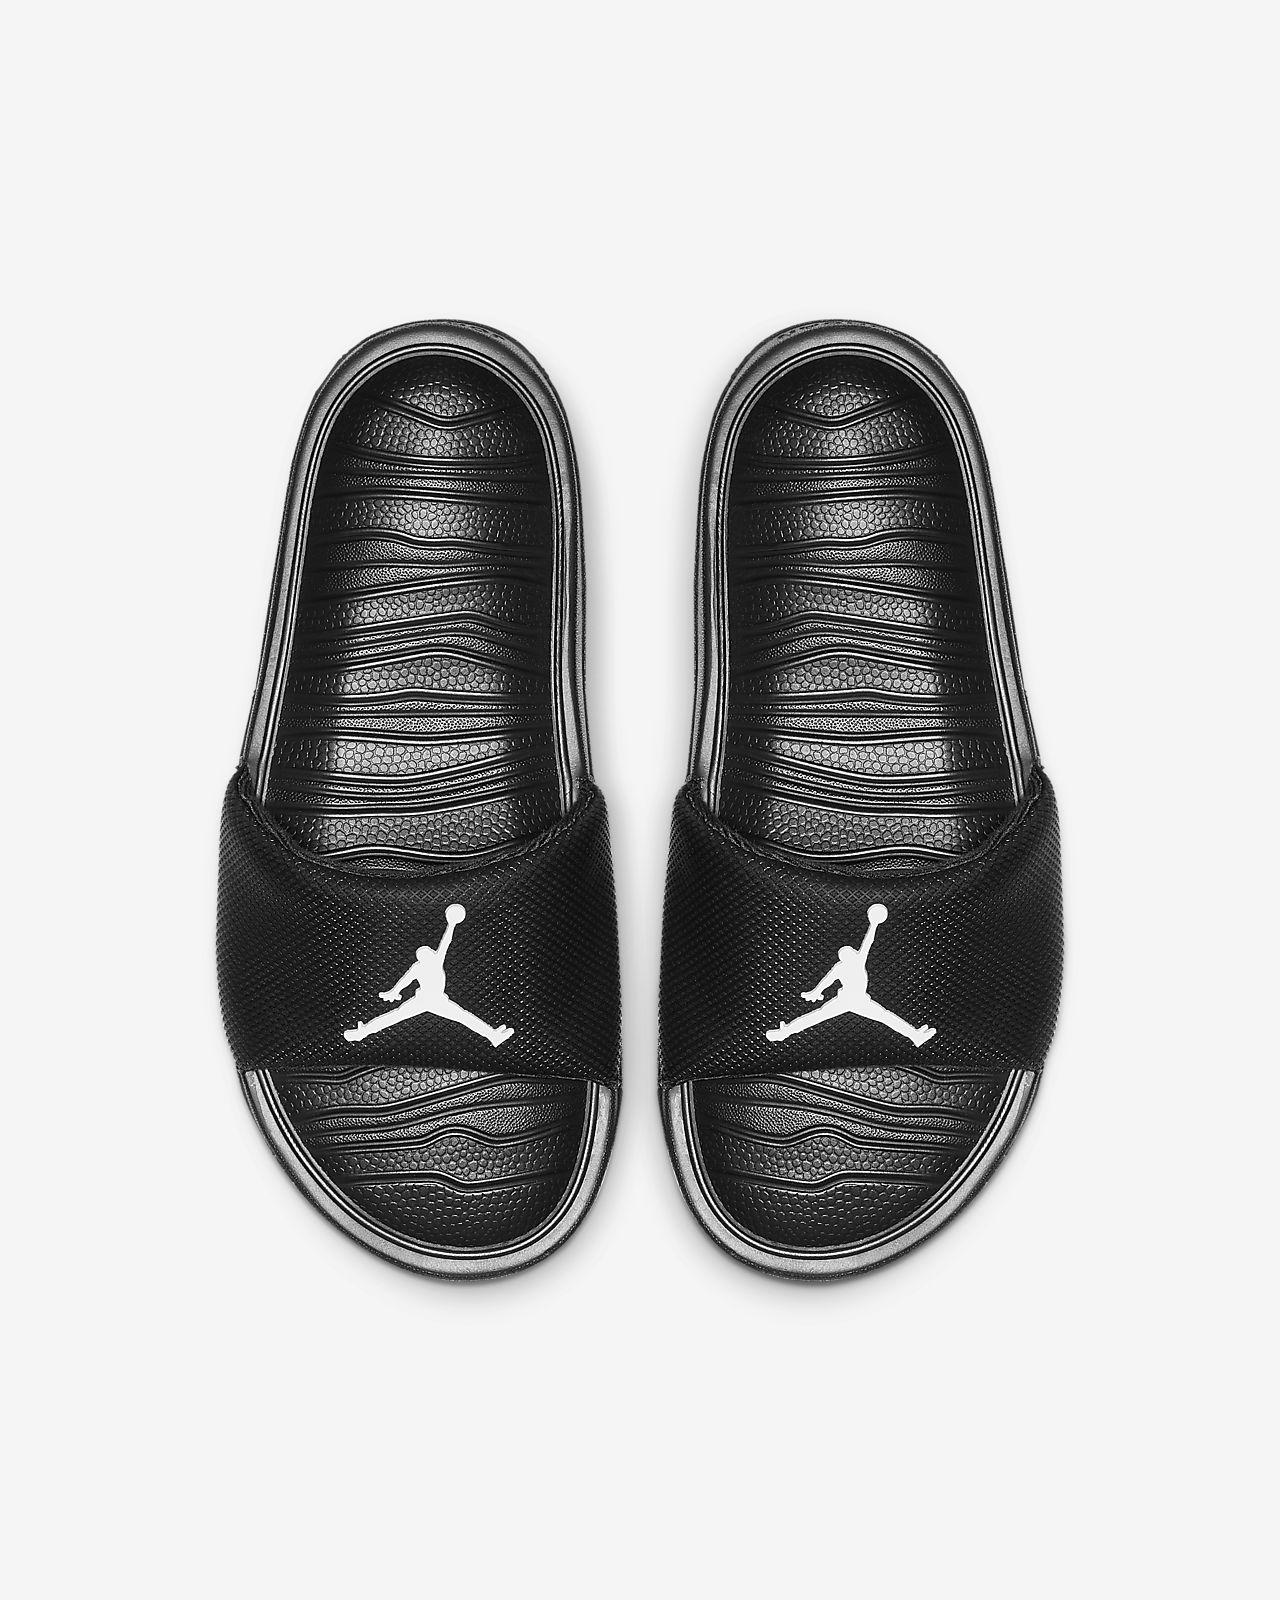 Jordan Break Badeslipper für ältere Kinder